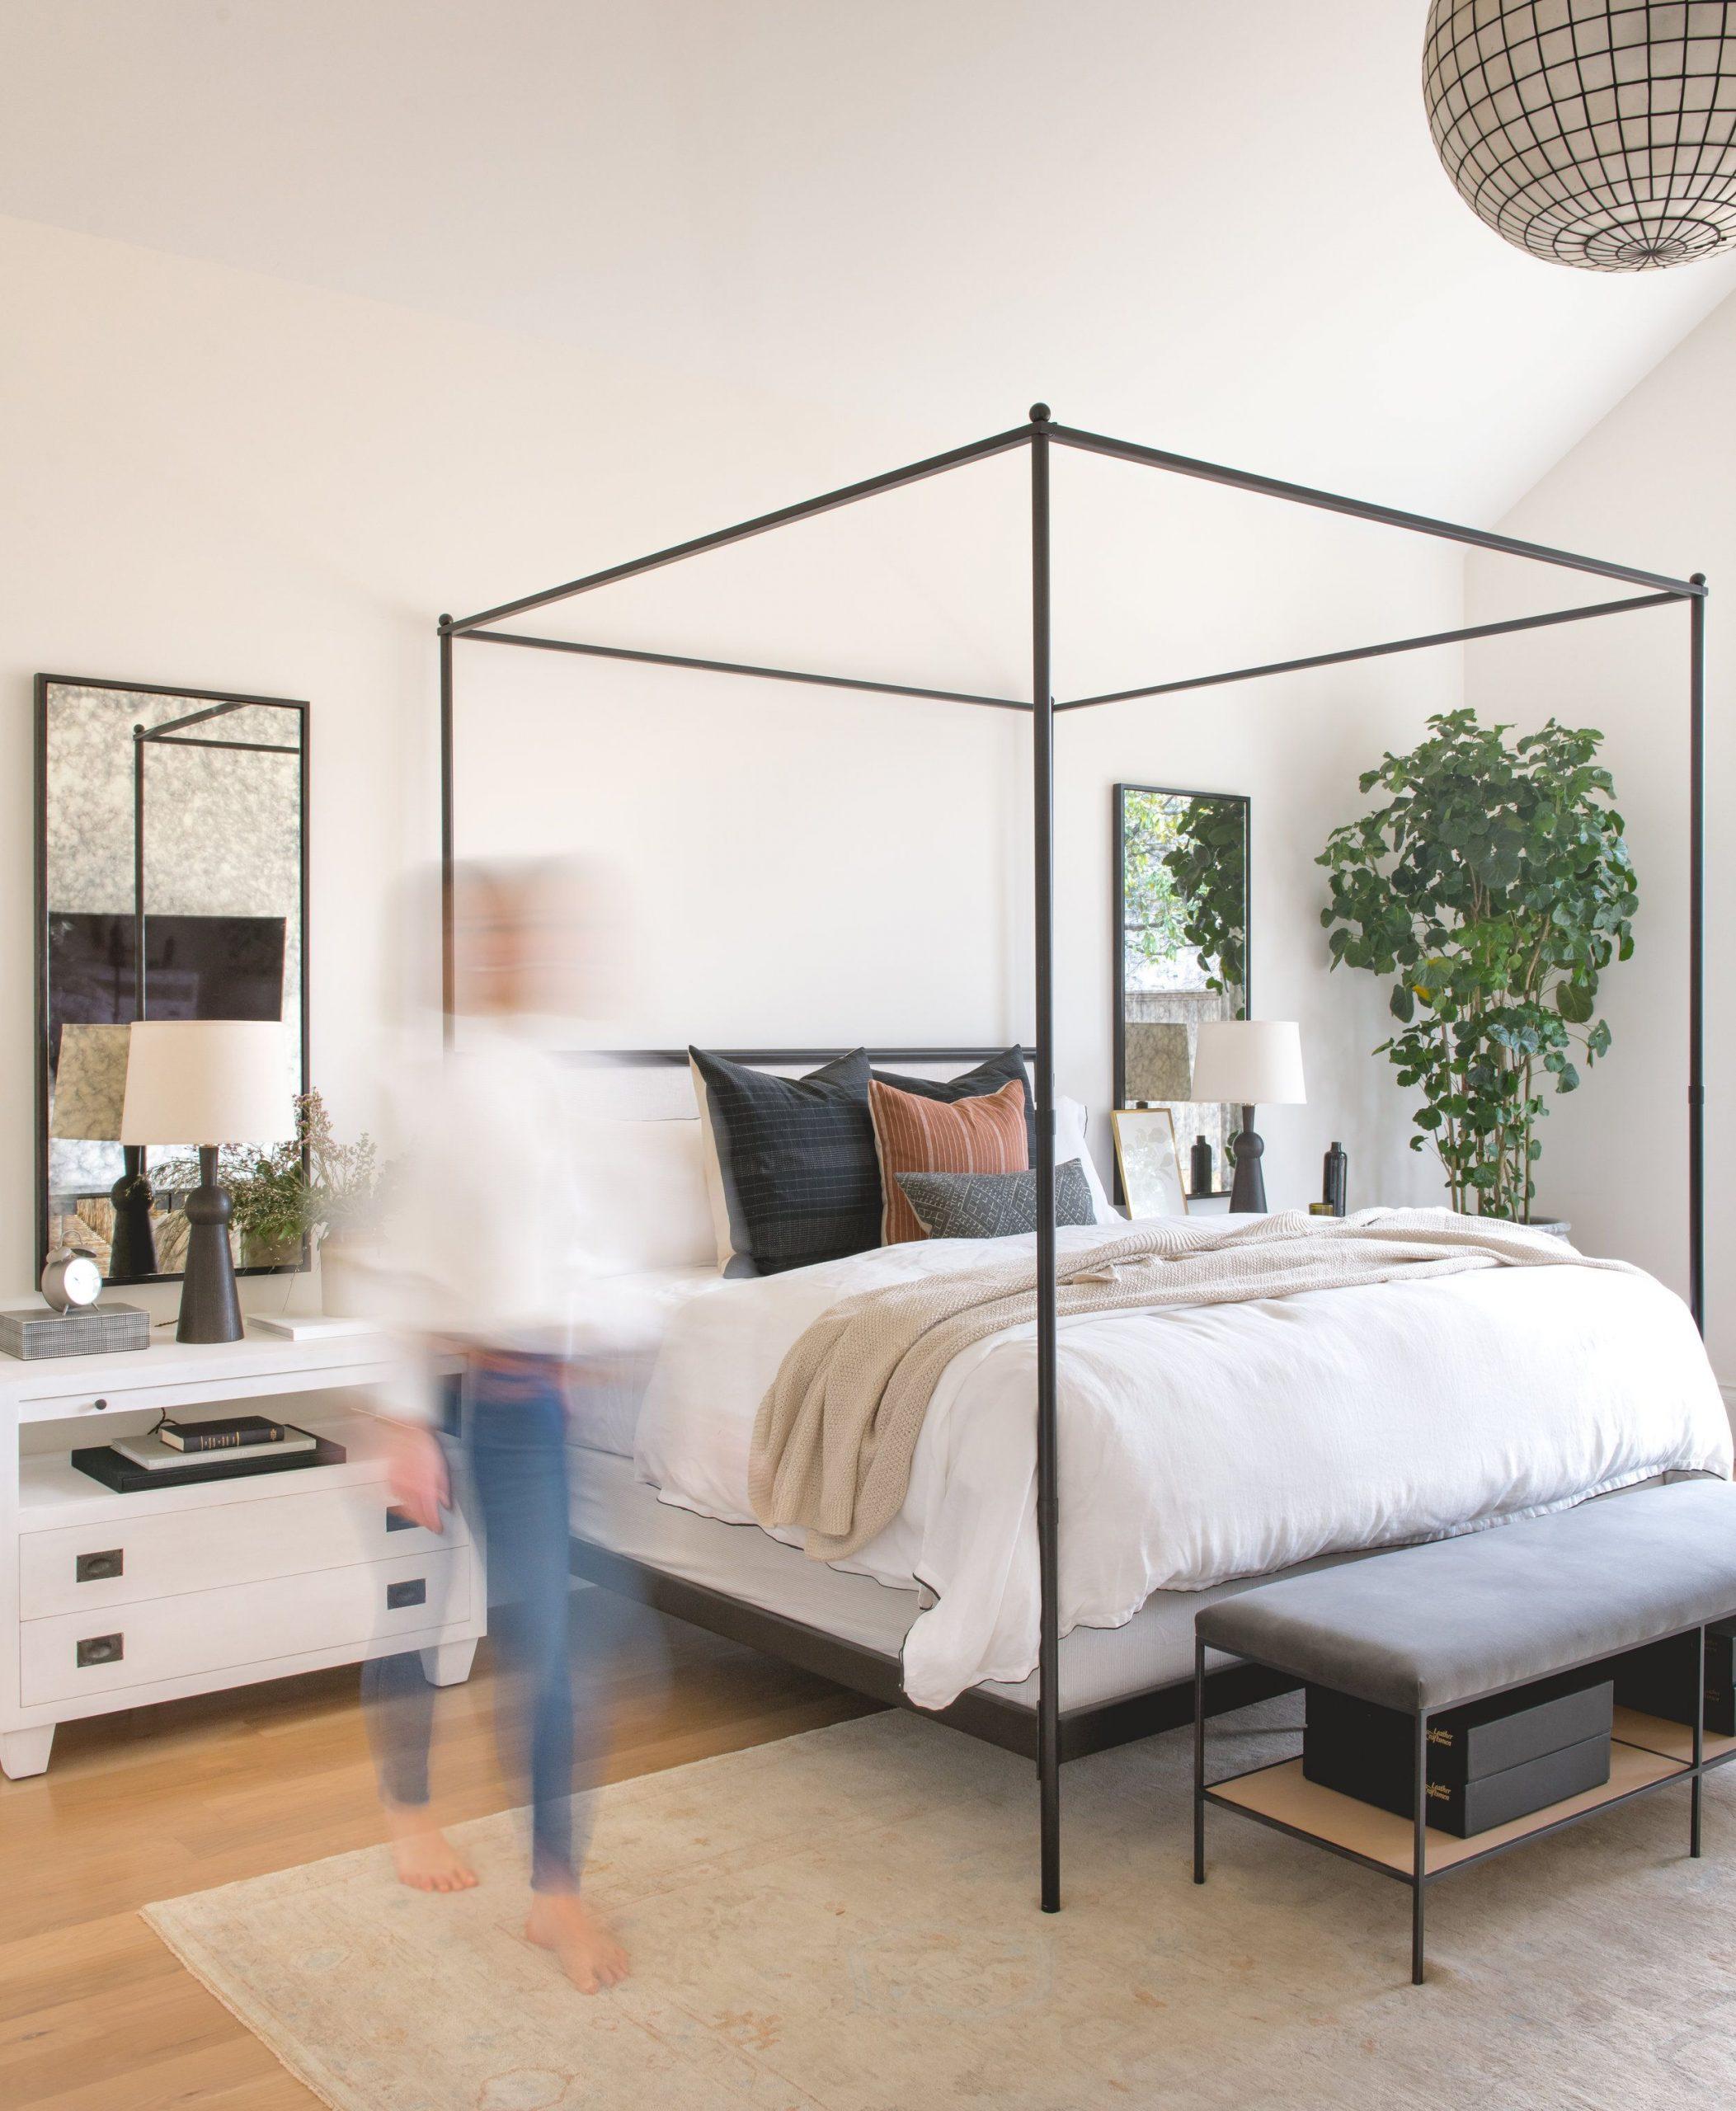 Bedroom Dallas Project  #bedroom #modernbedroom #classicdesign #bedframe #modern